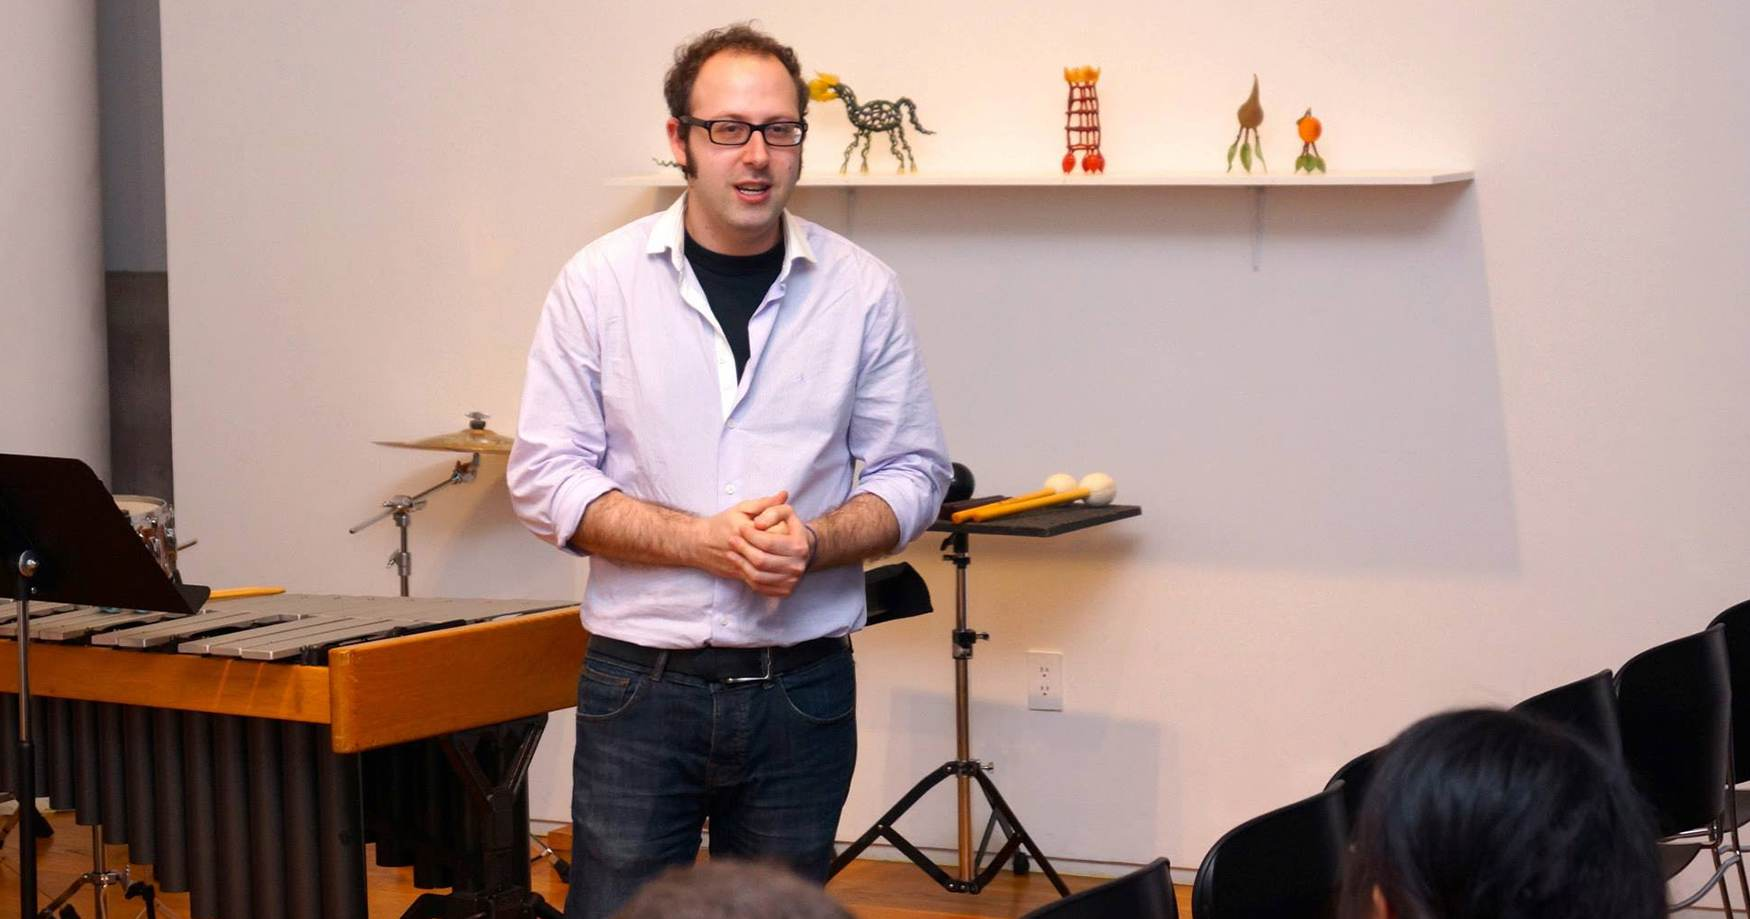 Composer Noam Faingold